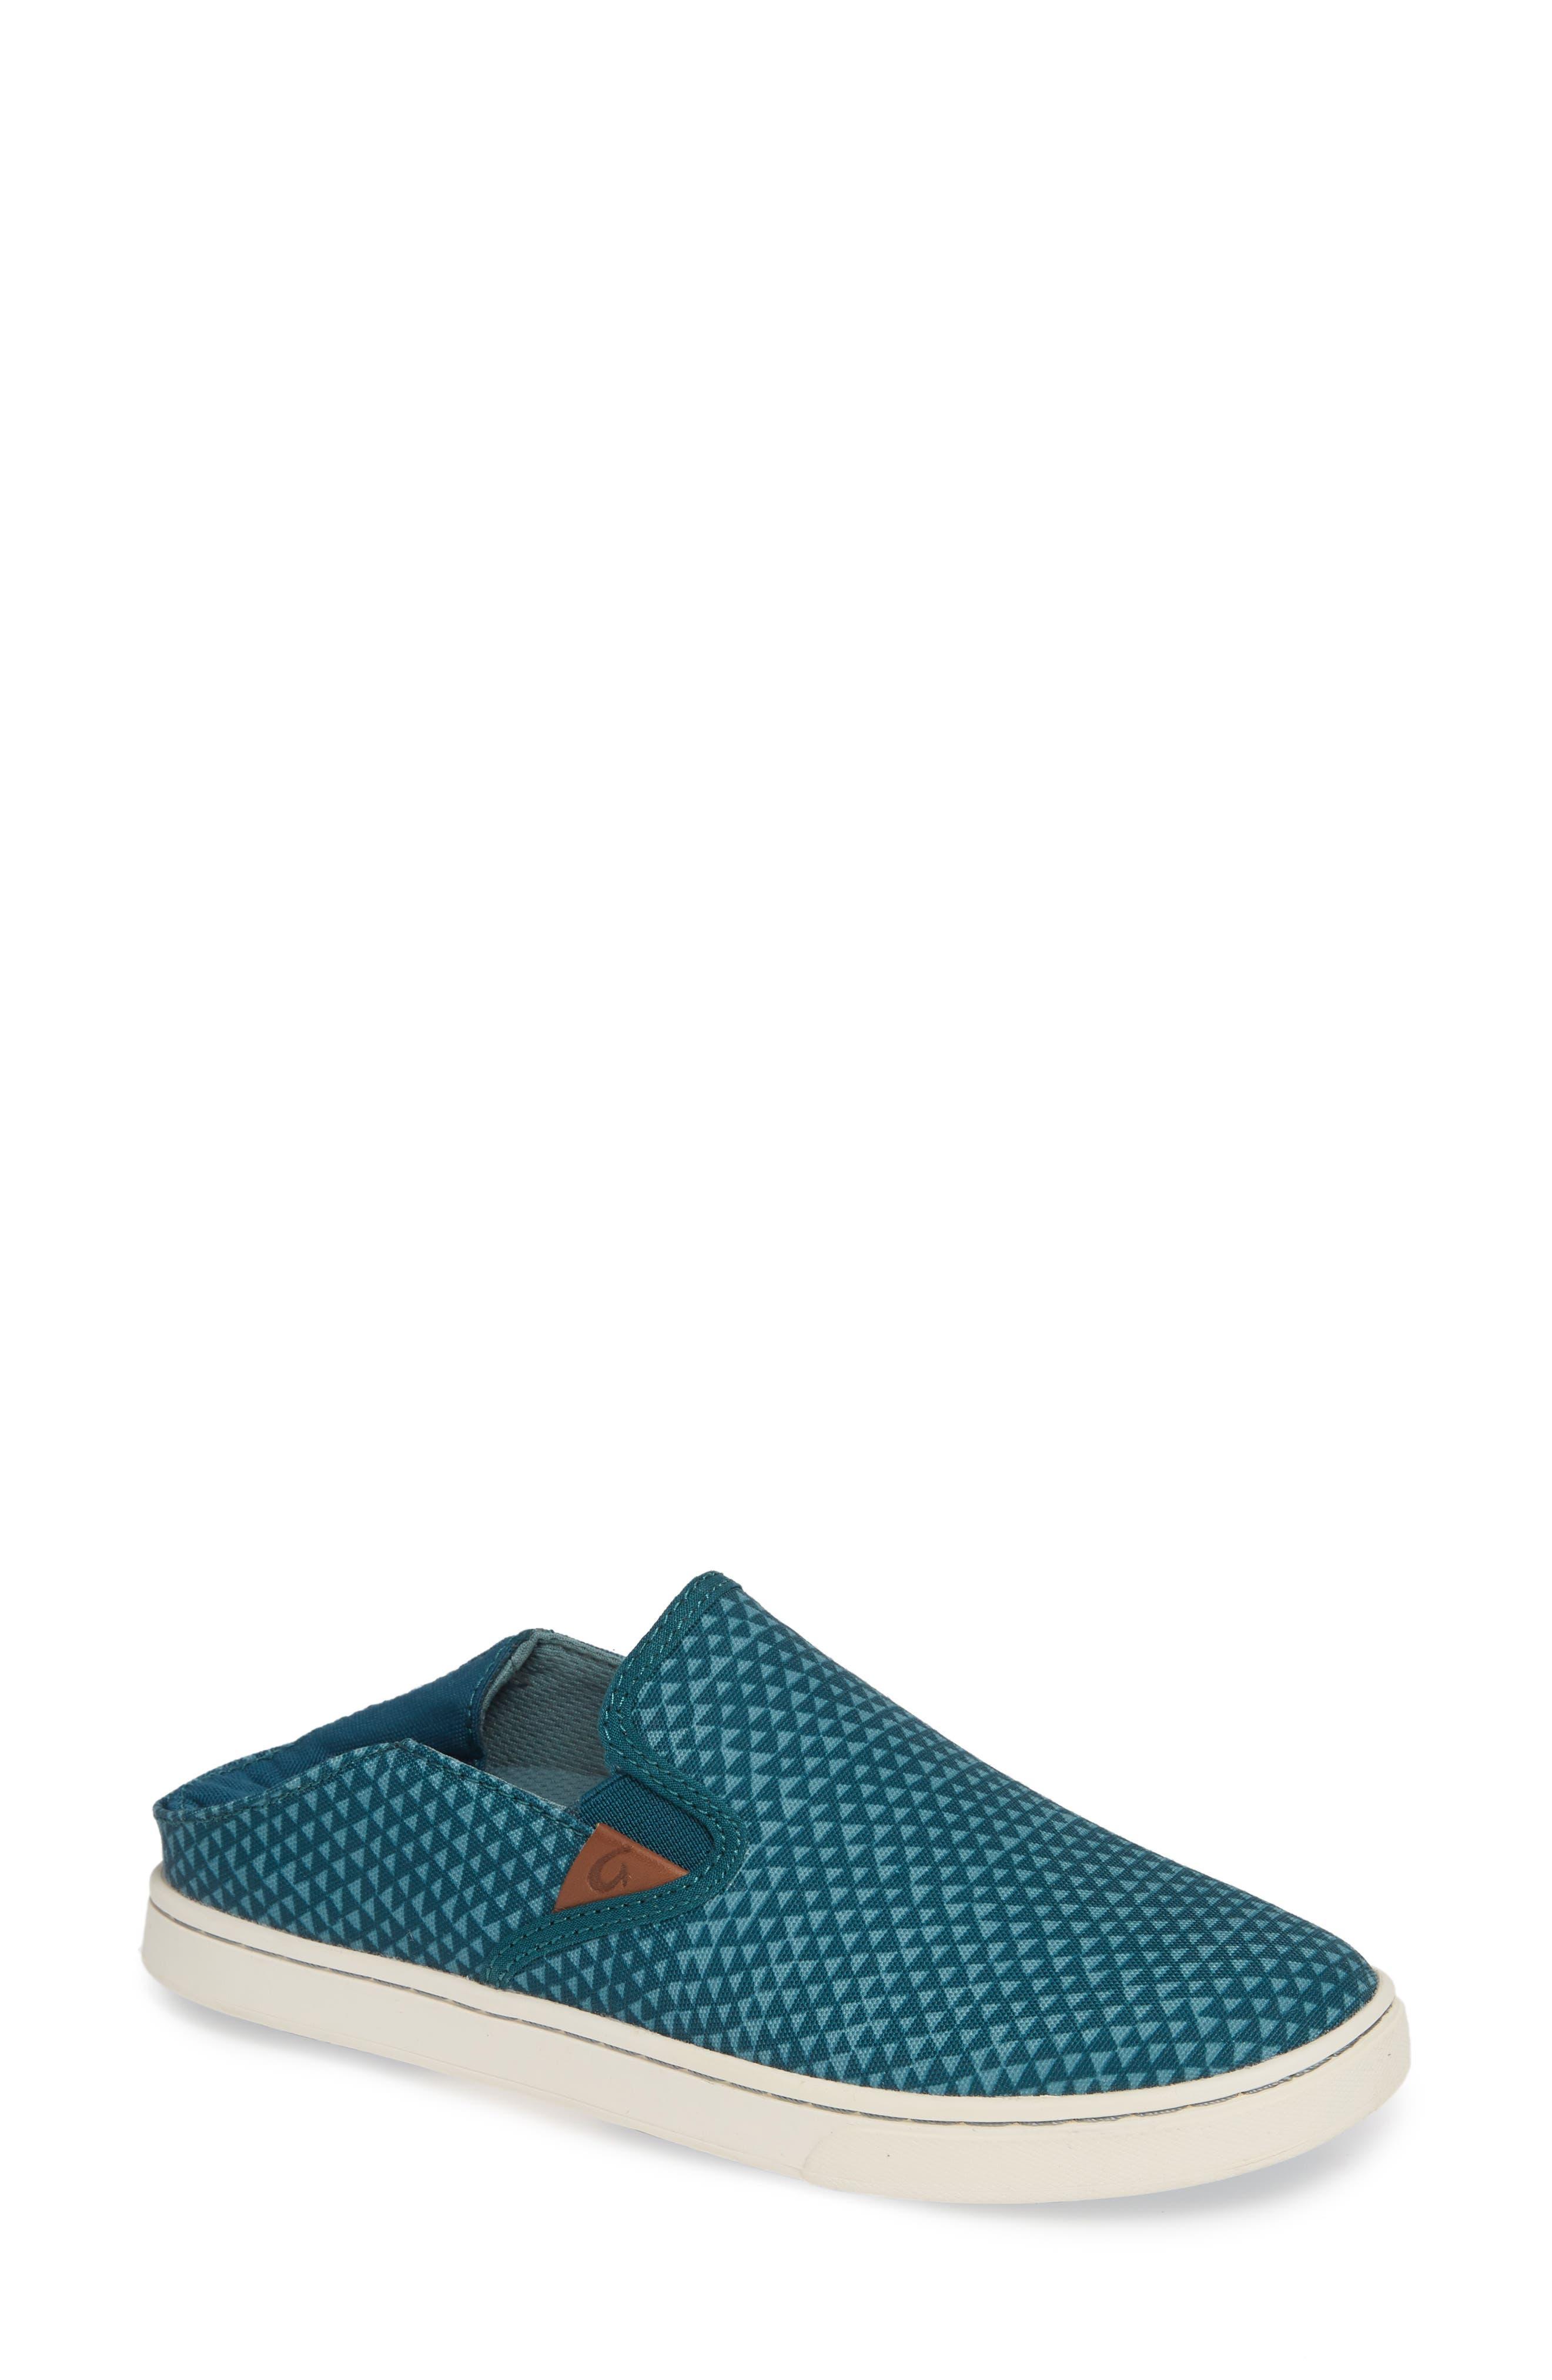 Pehuea Pa'i Convertible Sneaker,                             Main thumbnail 1, color,                             DEEP TEAL/ TRIANGLE FABRIC